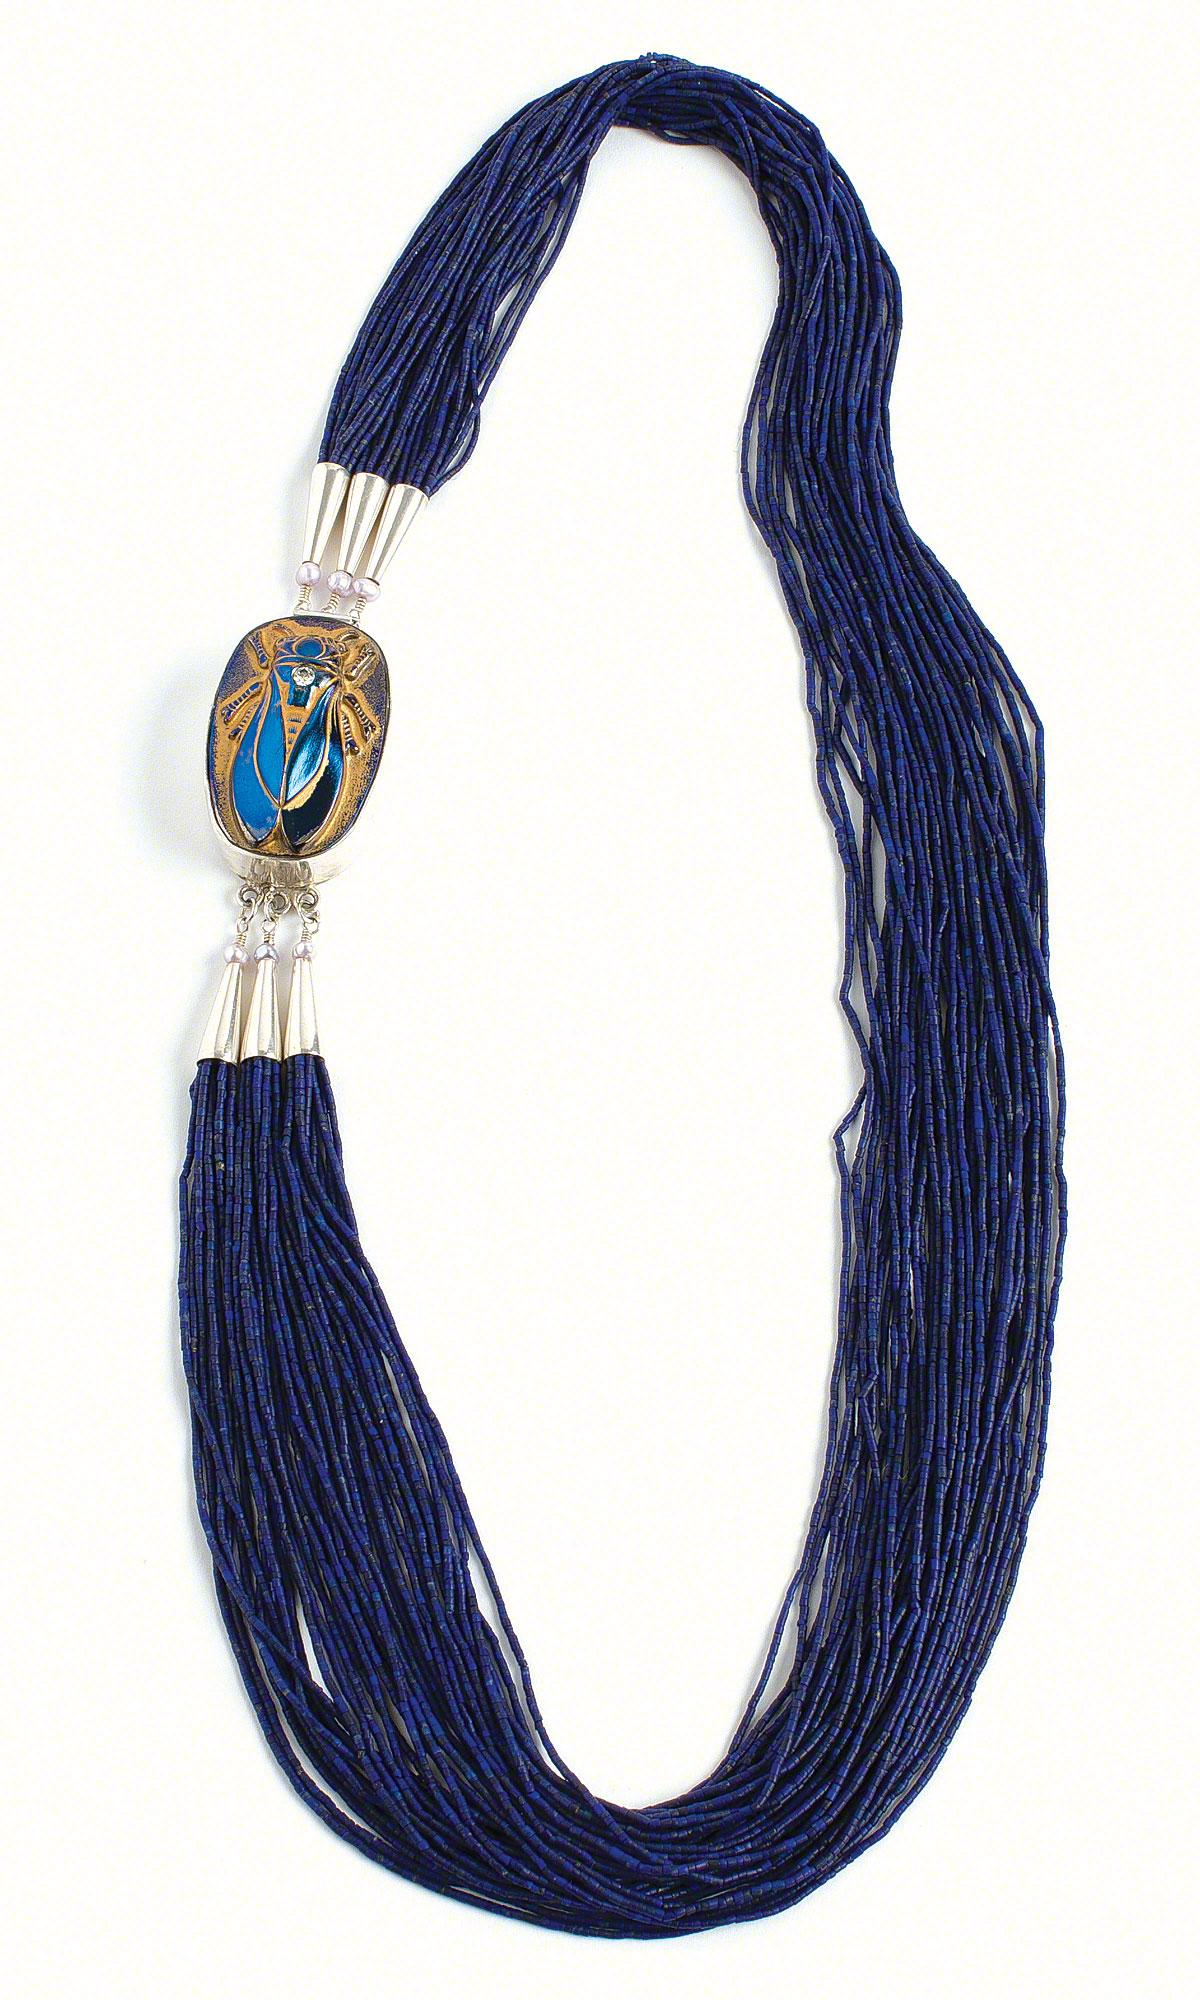 Jewelry Design - Multi-Strand Necklace with Lapis Lazuli Gemstone ...